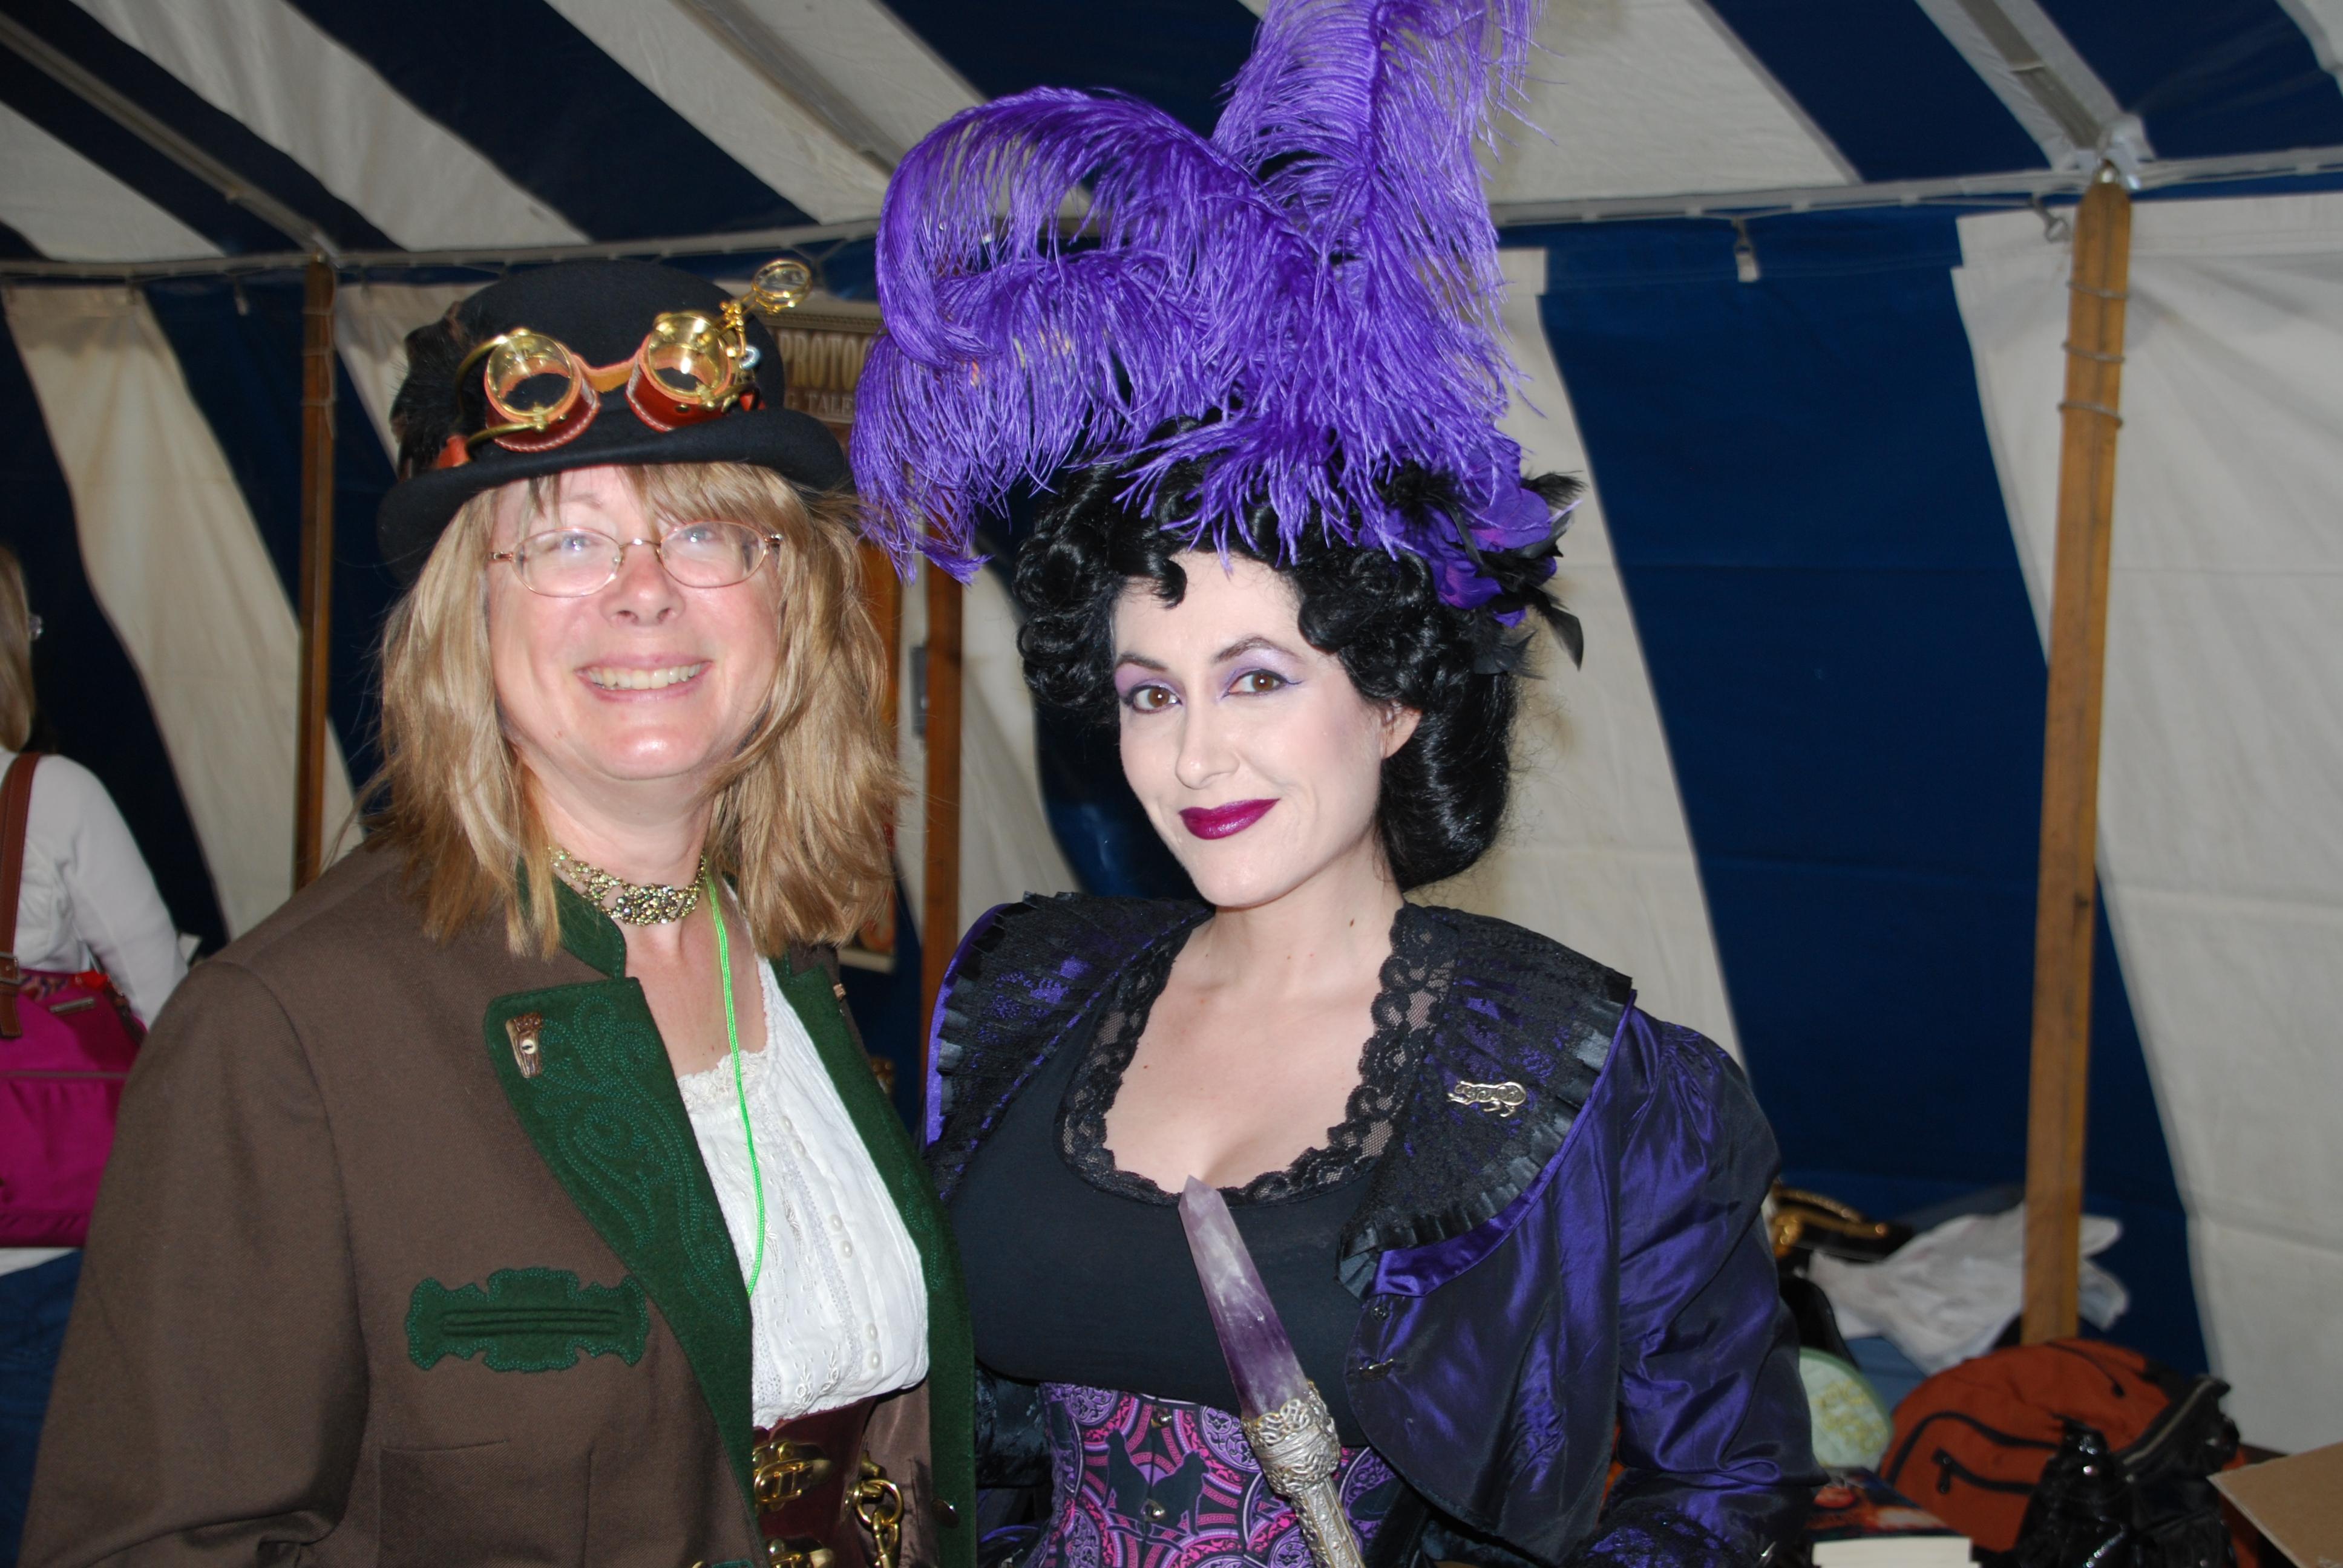 Author Shelley Adina and costumer Aleta Pardalis